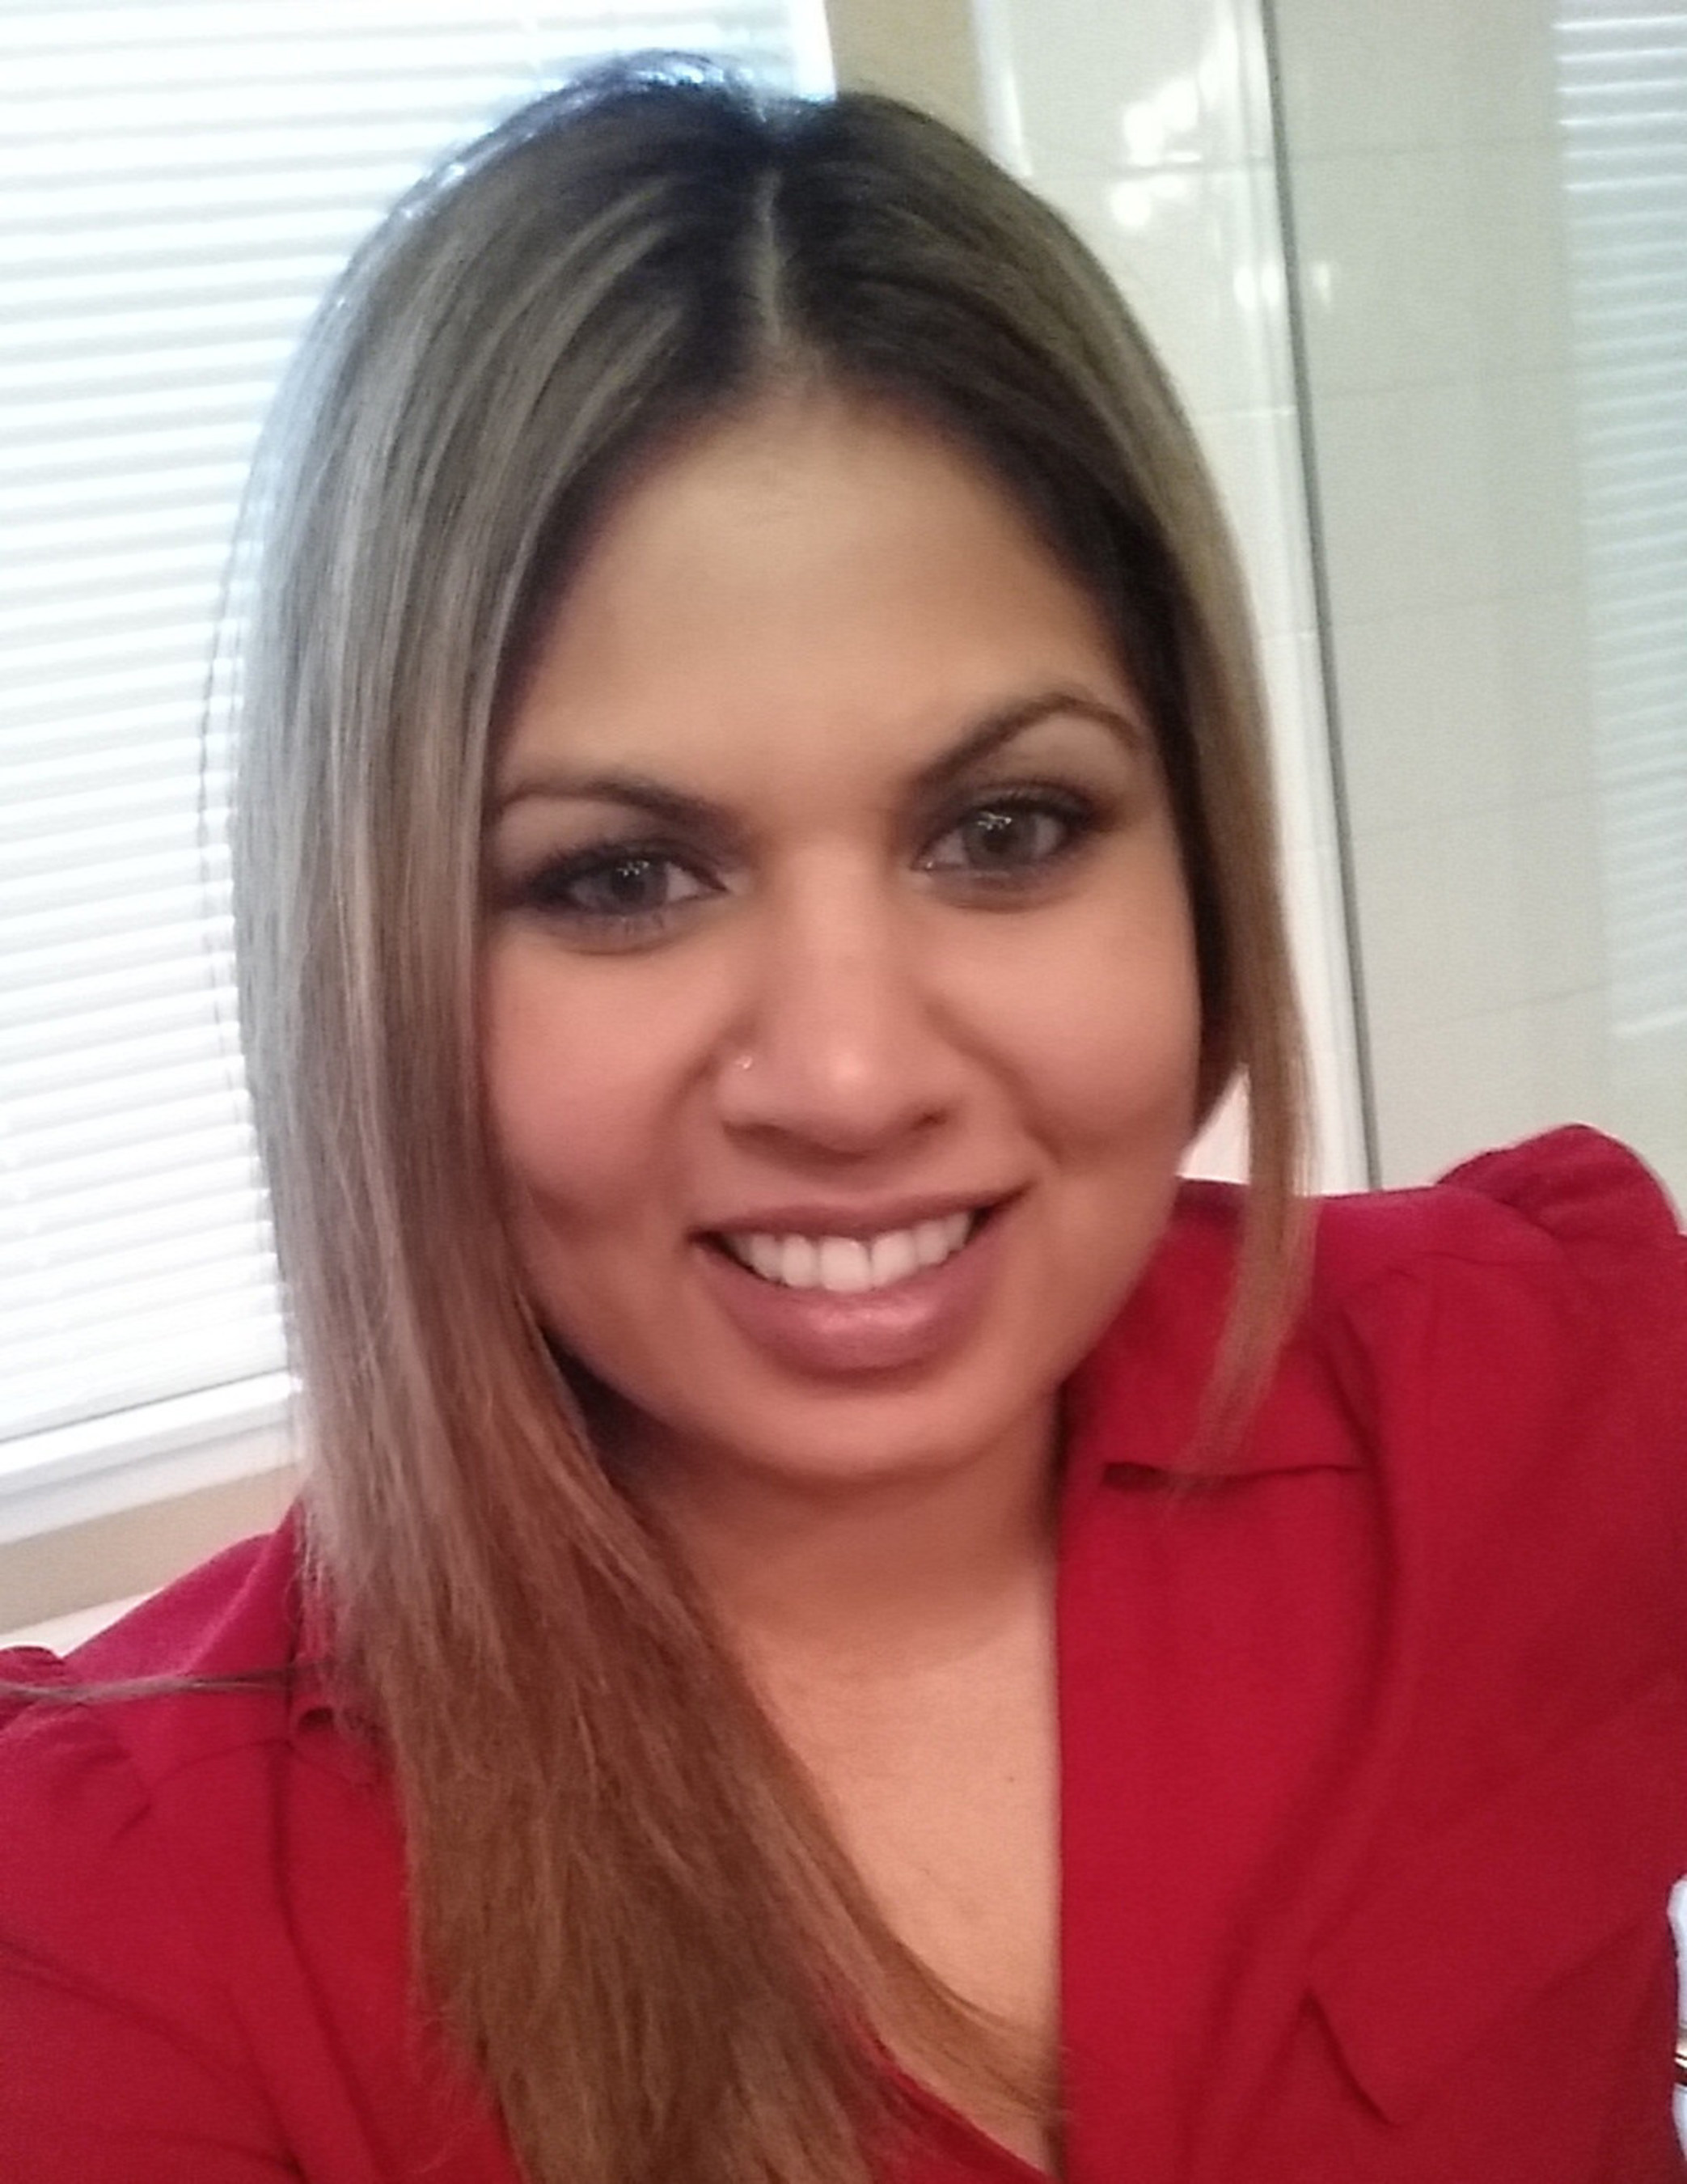 Amber Omran - National Sales Manager of NESA and VST brands